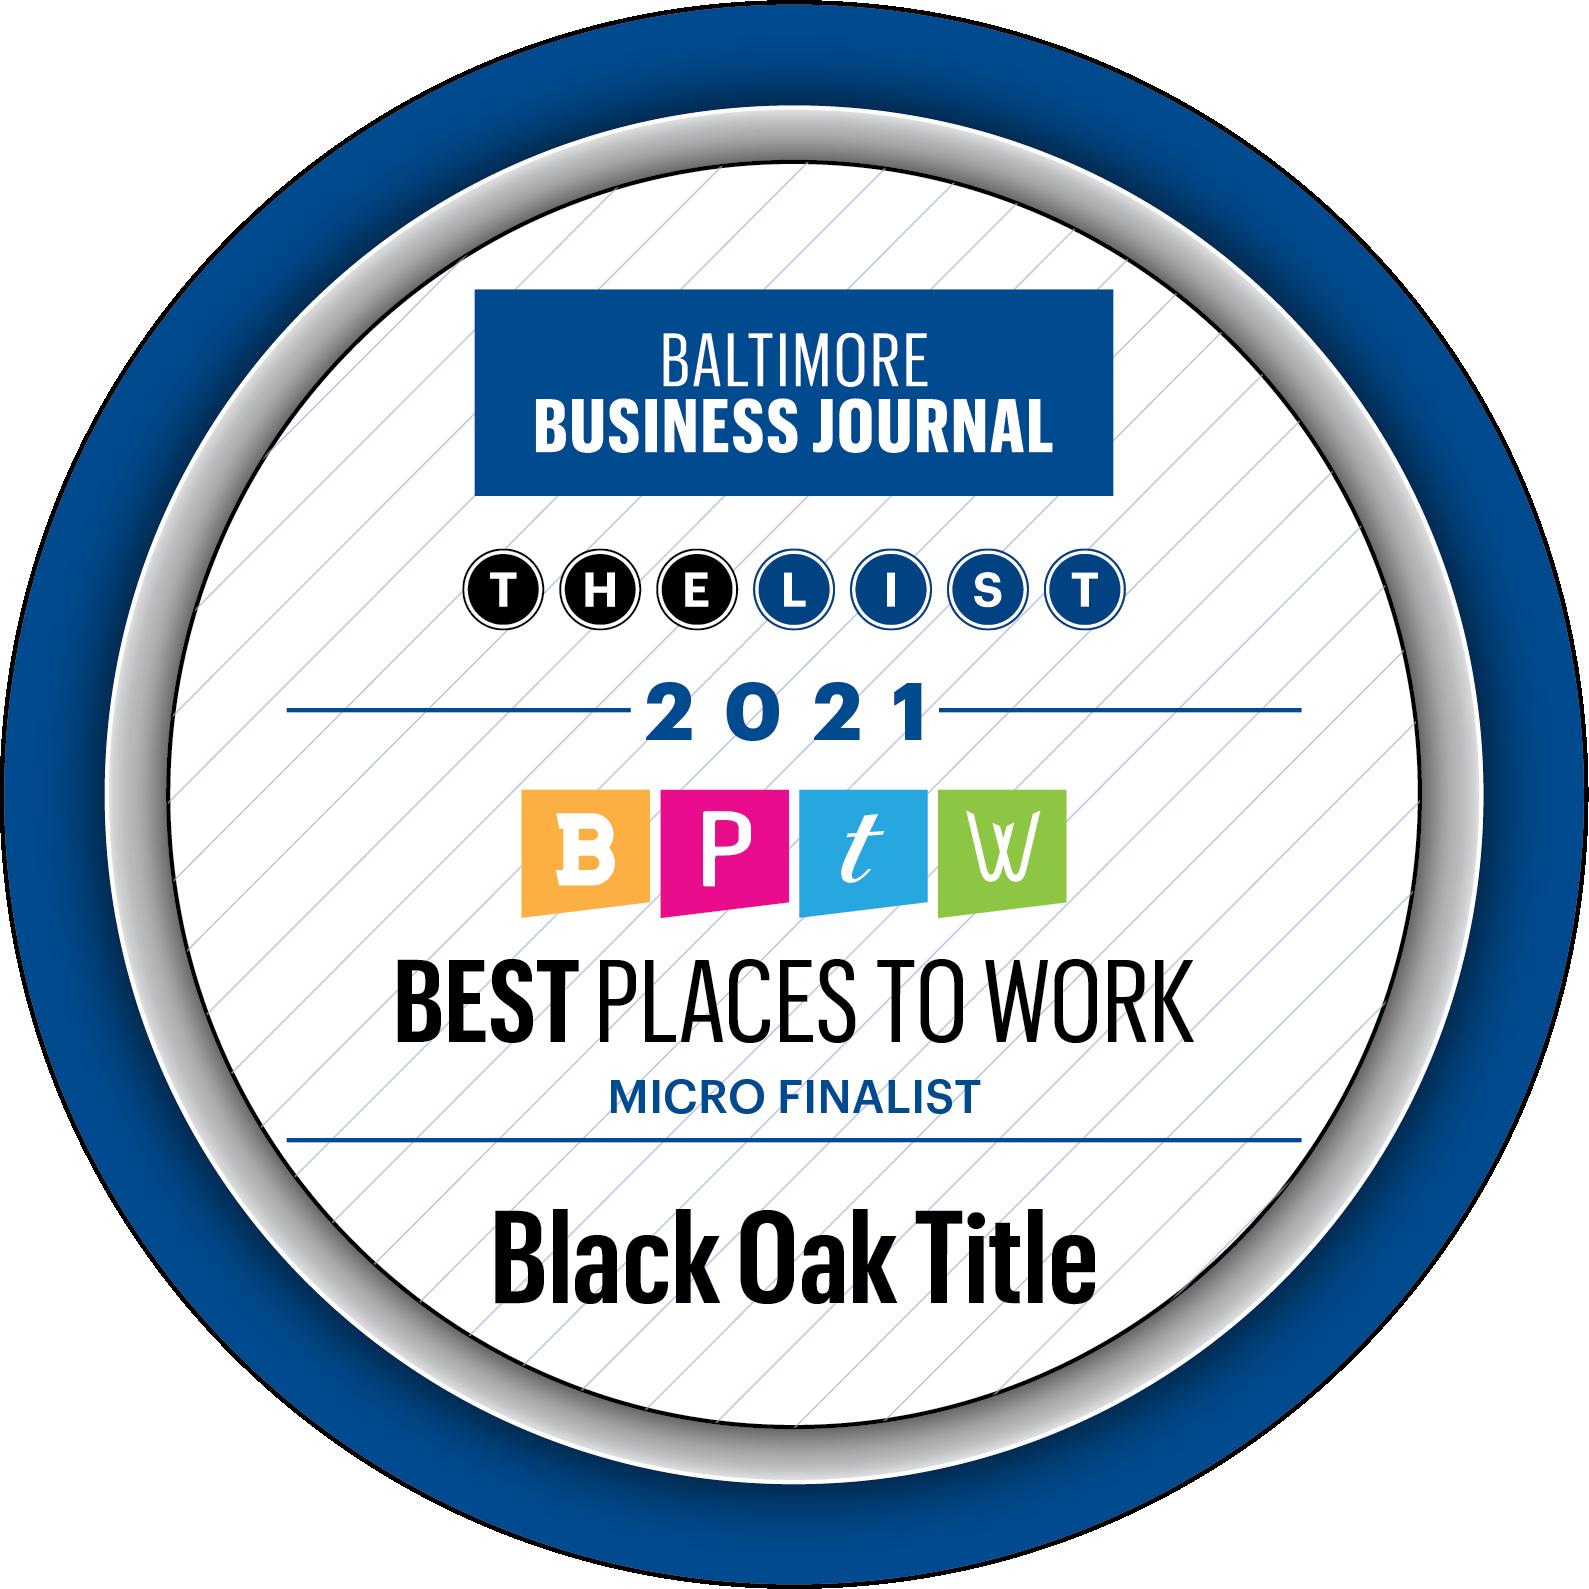 Baltimore Business Journal Microfinalist badge